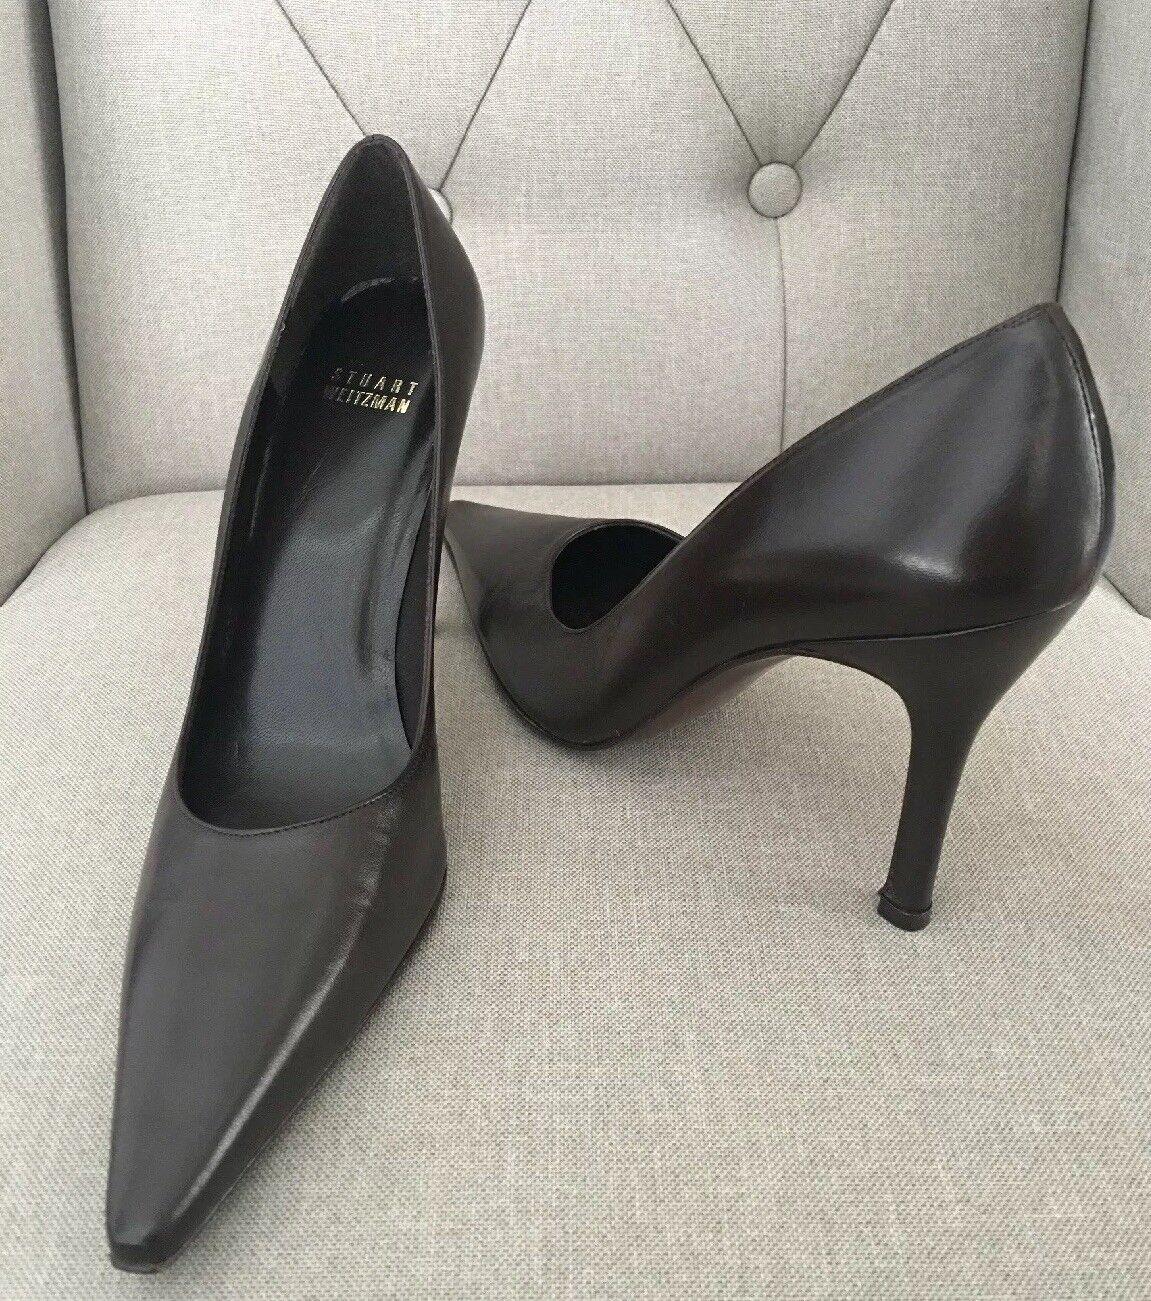 Stuart Weitzman Princess Pump Dark Brown Leather 8.5N New Without Box